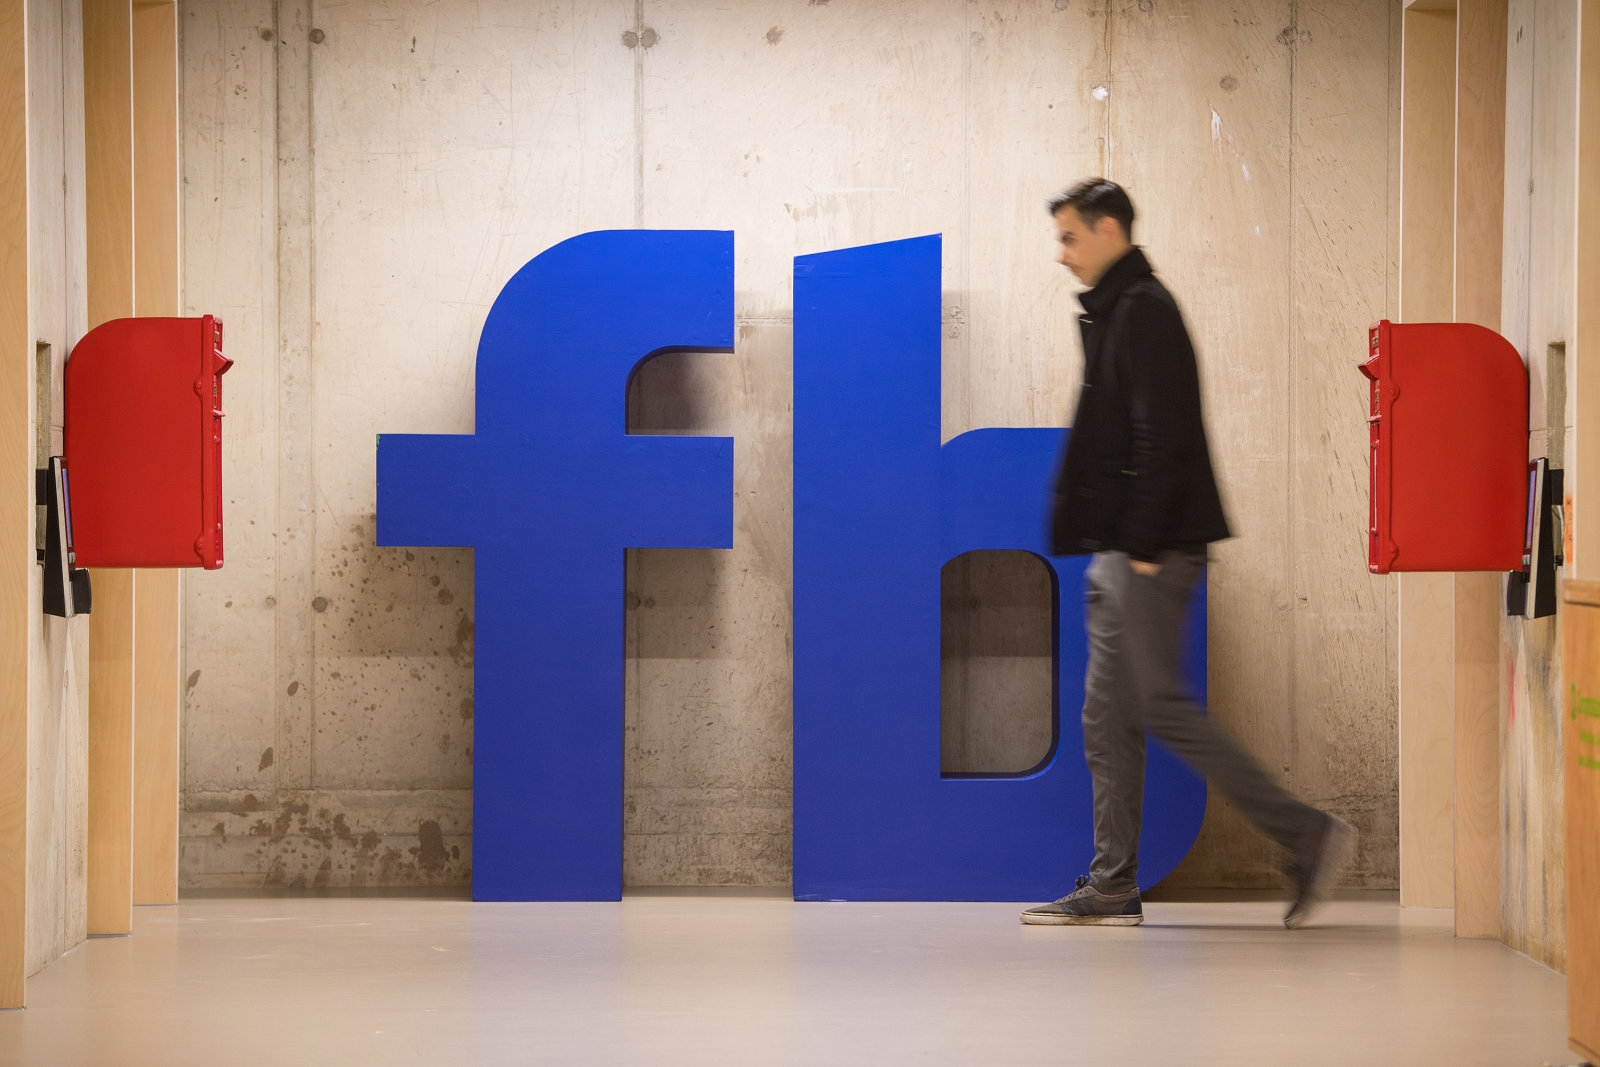 Facebook ad blocker safeguards limit political transparency campaigns | DeviceDaily.com